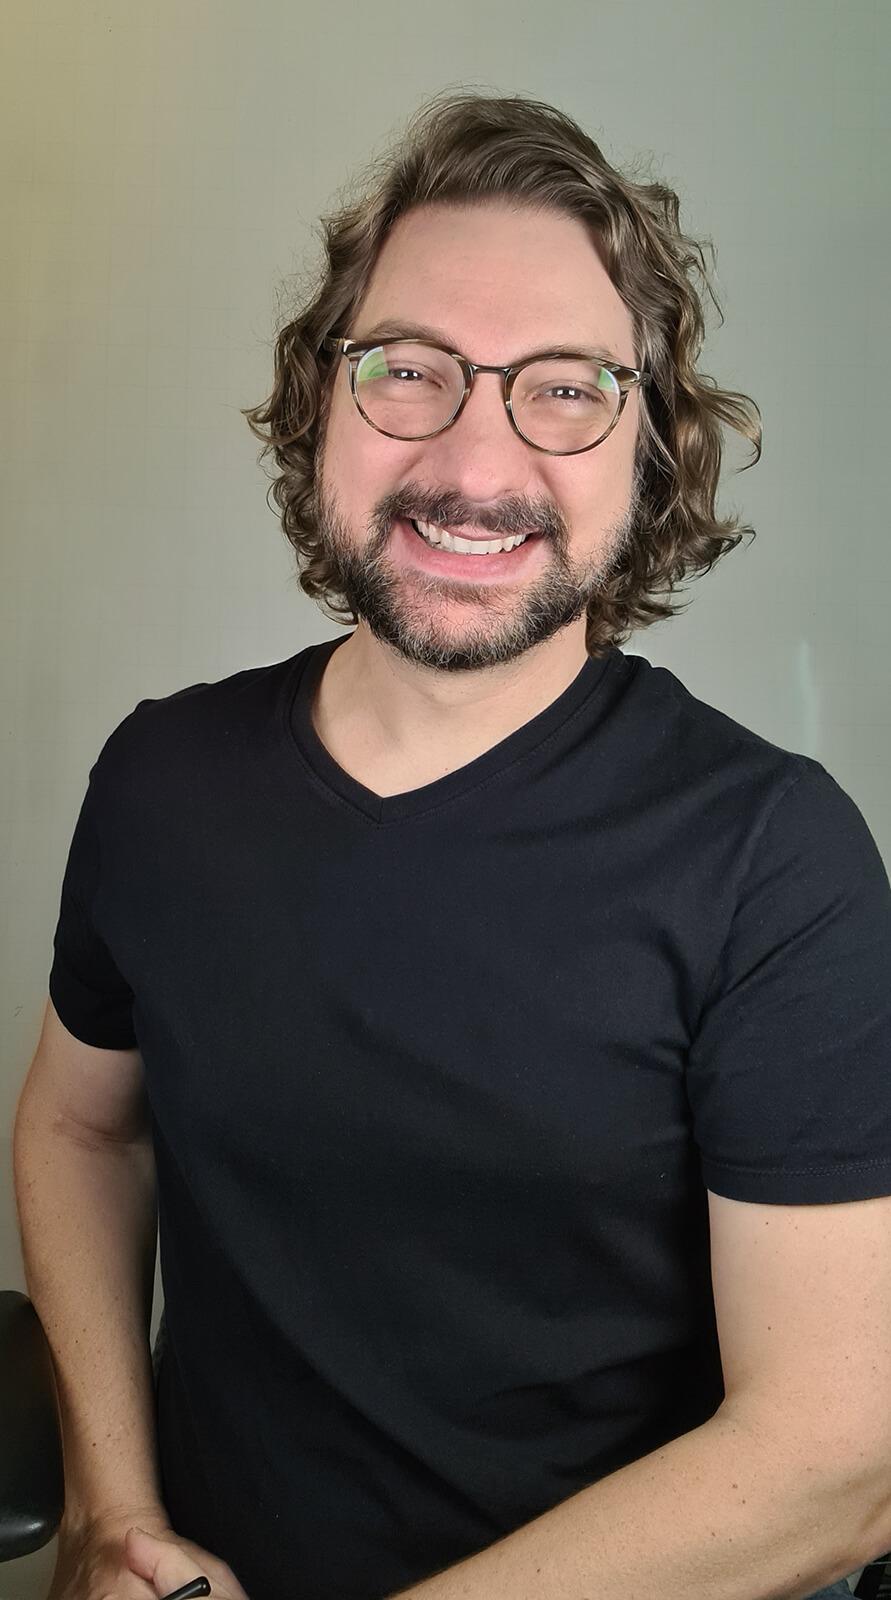 Andrei Gurgel